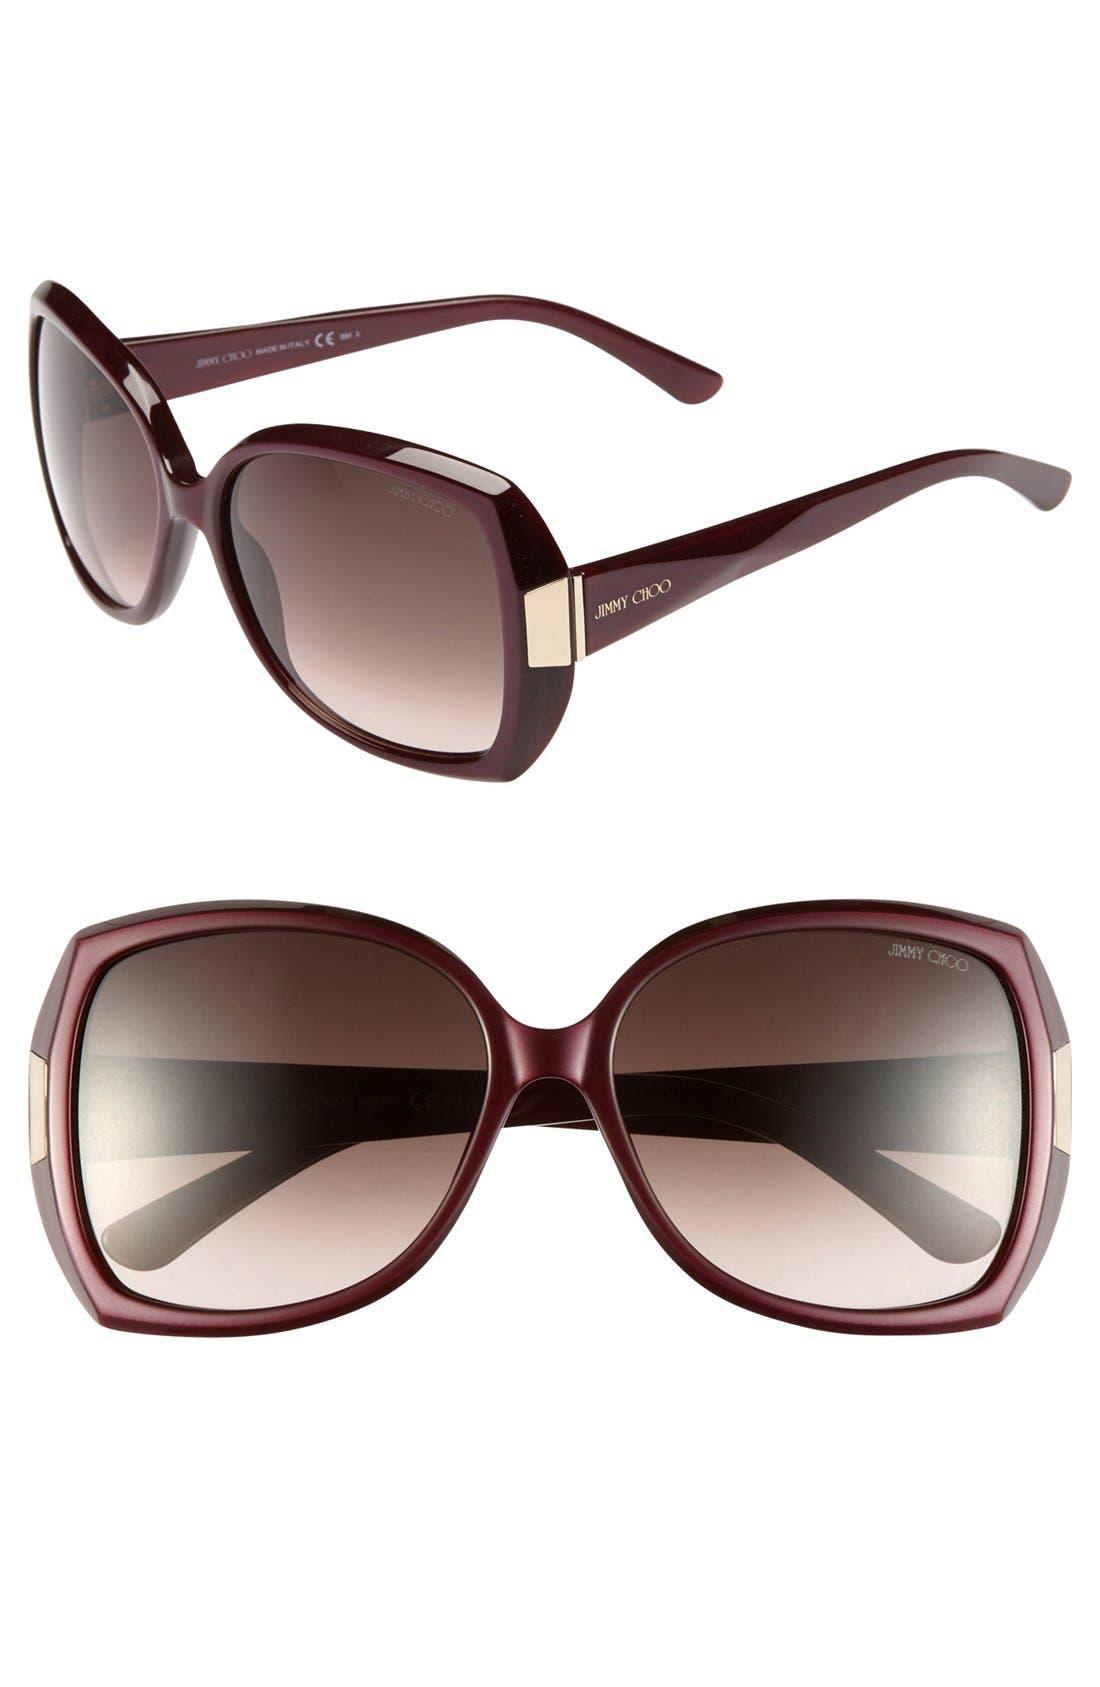 Alternate Image 1 Selected - Jimmy Choo 'Gaby' Oversized Sunglasses